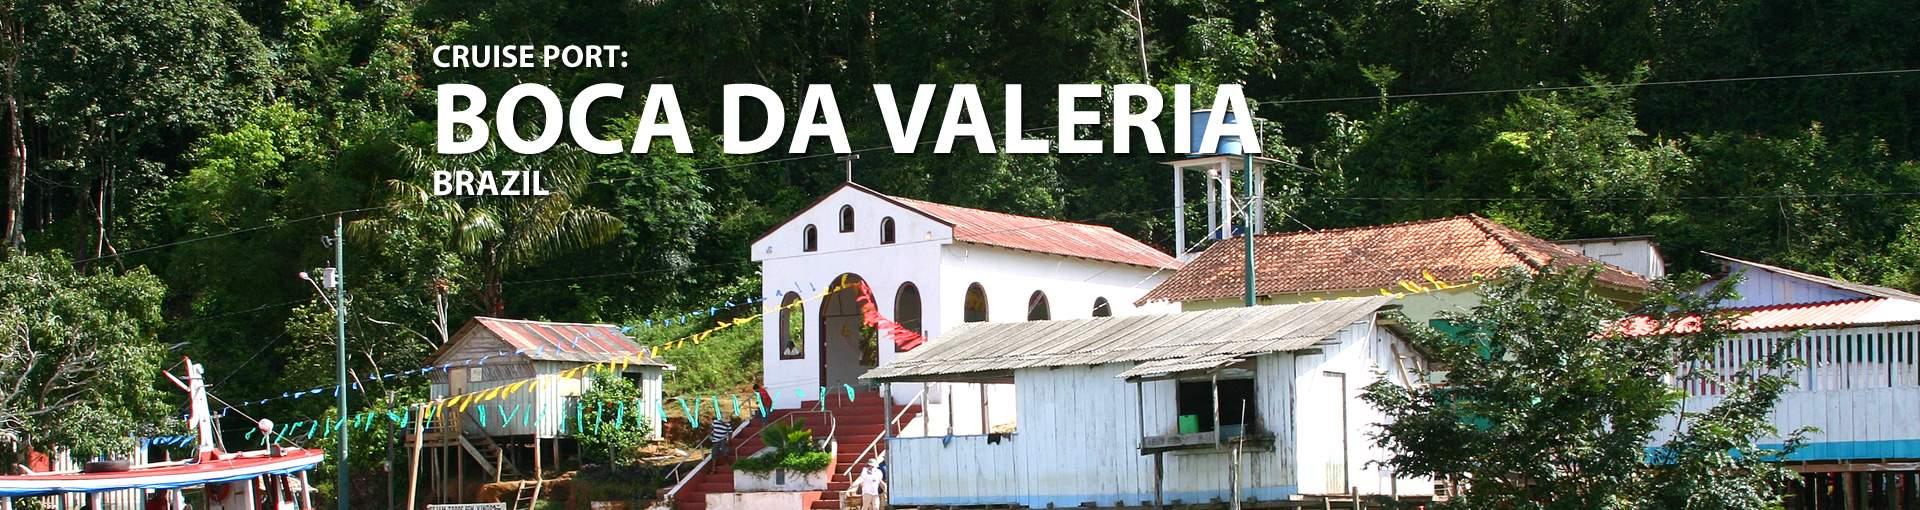 Cruises to Boca Da Valeria, Brazil